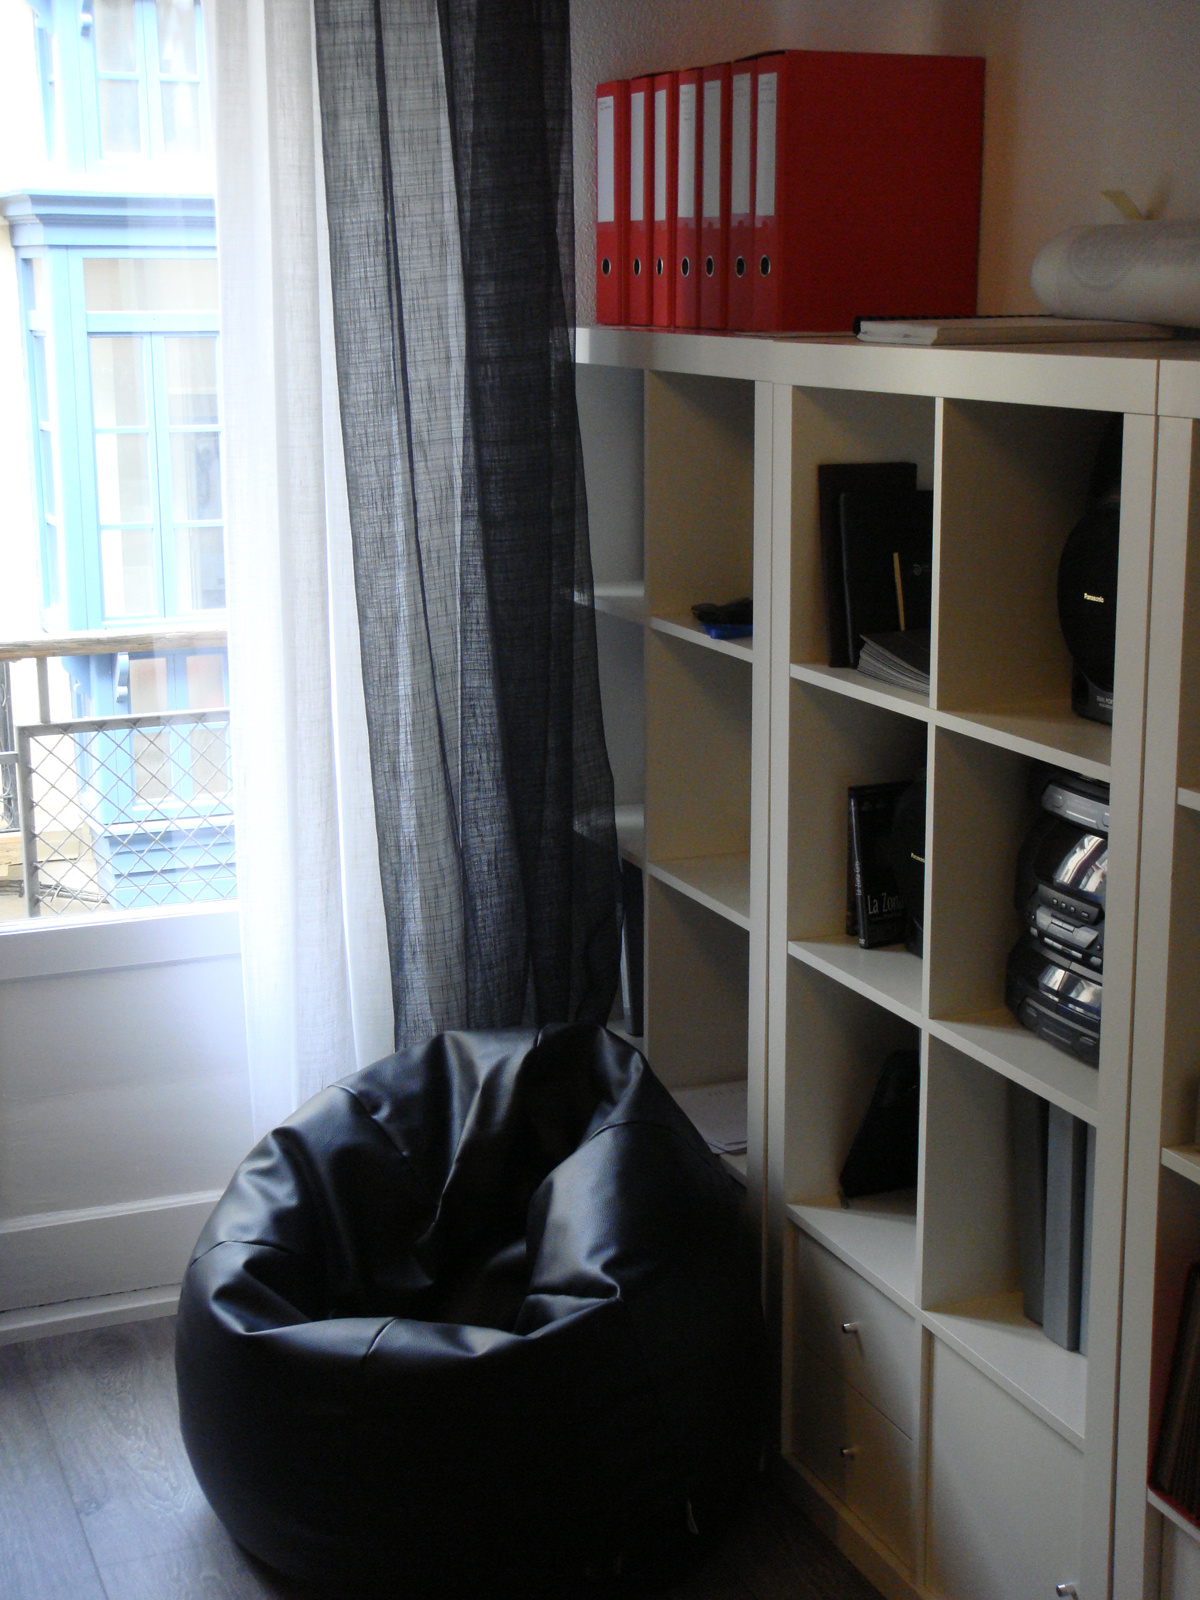 Work room image 1